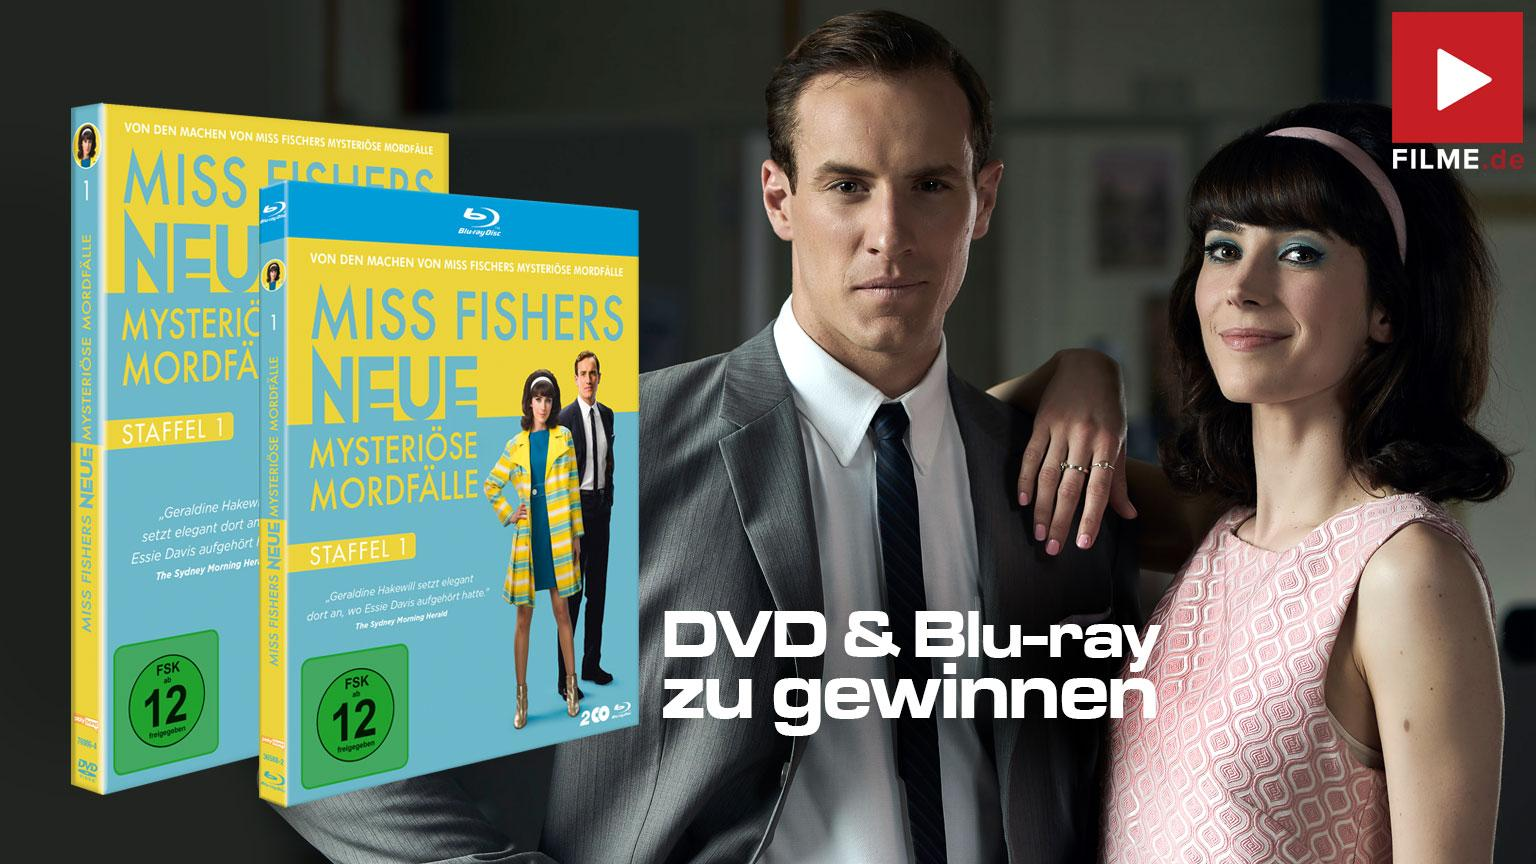 Miss Fishers neue mysteriöse Mordfälle - Staffel 1 shop kaufen Gewinnspiel Artikelbild